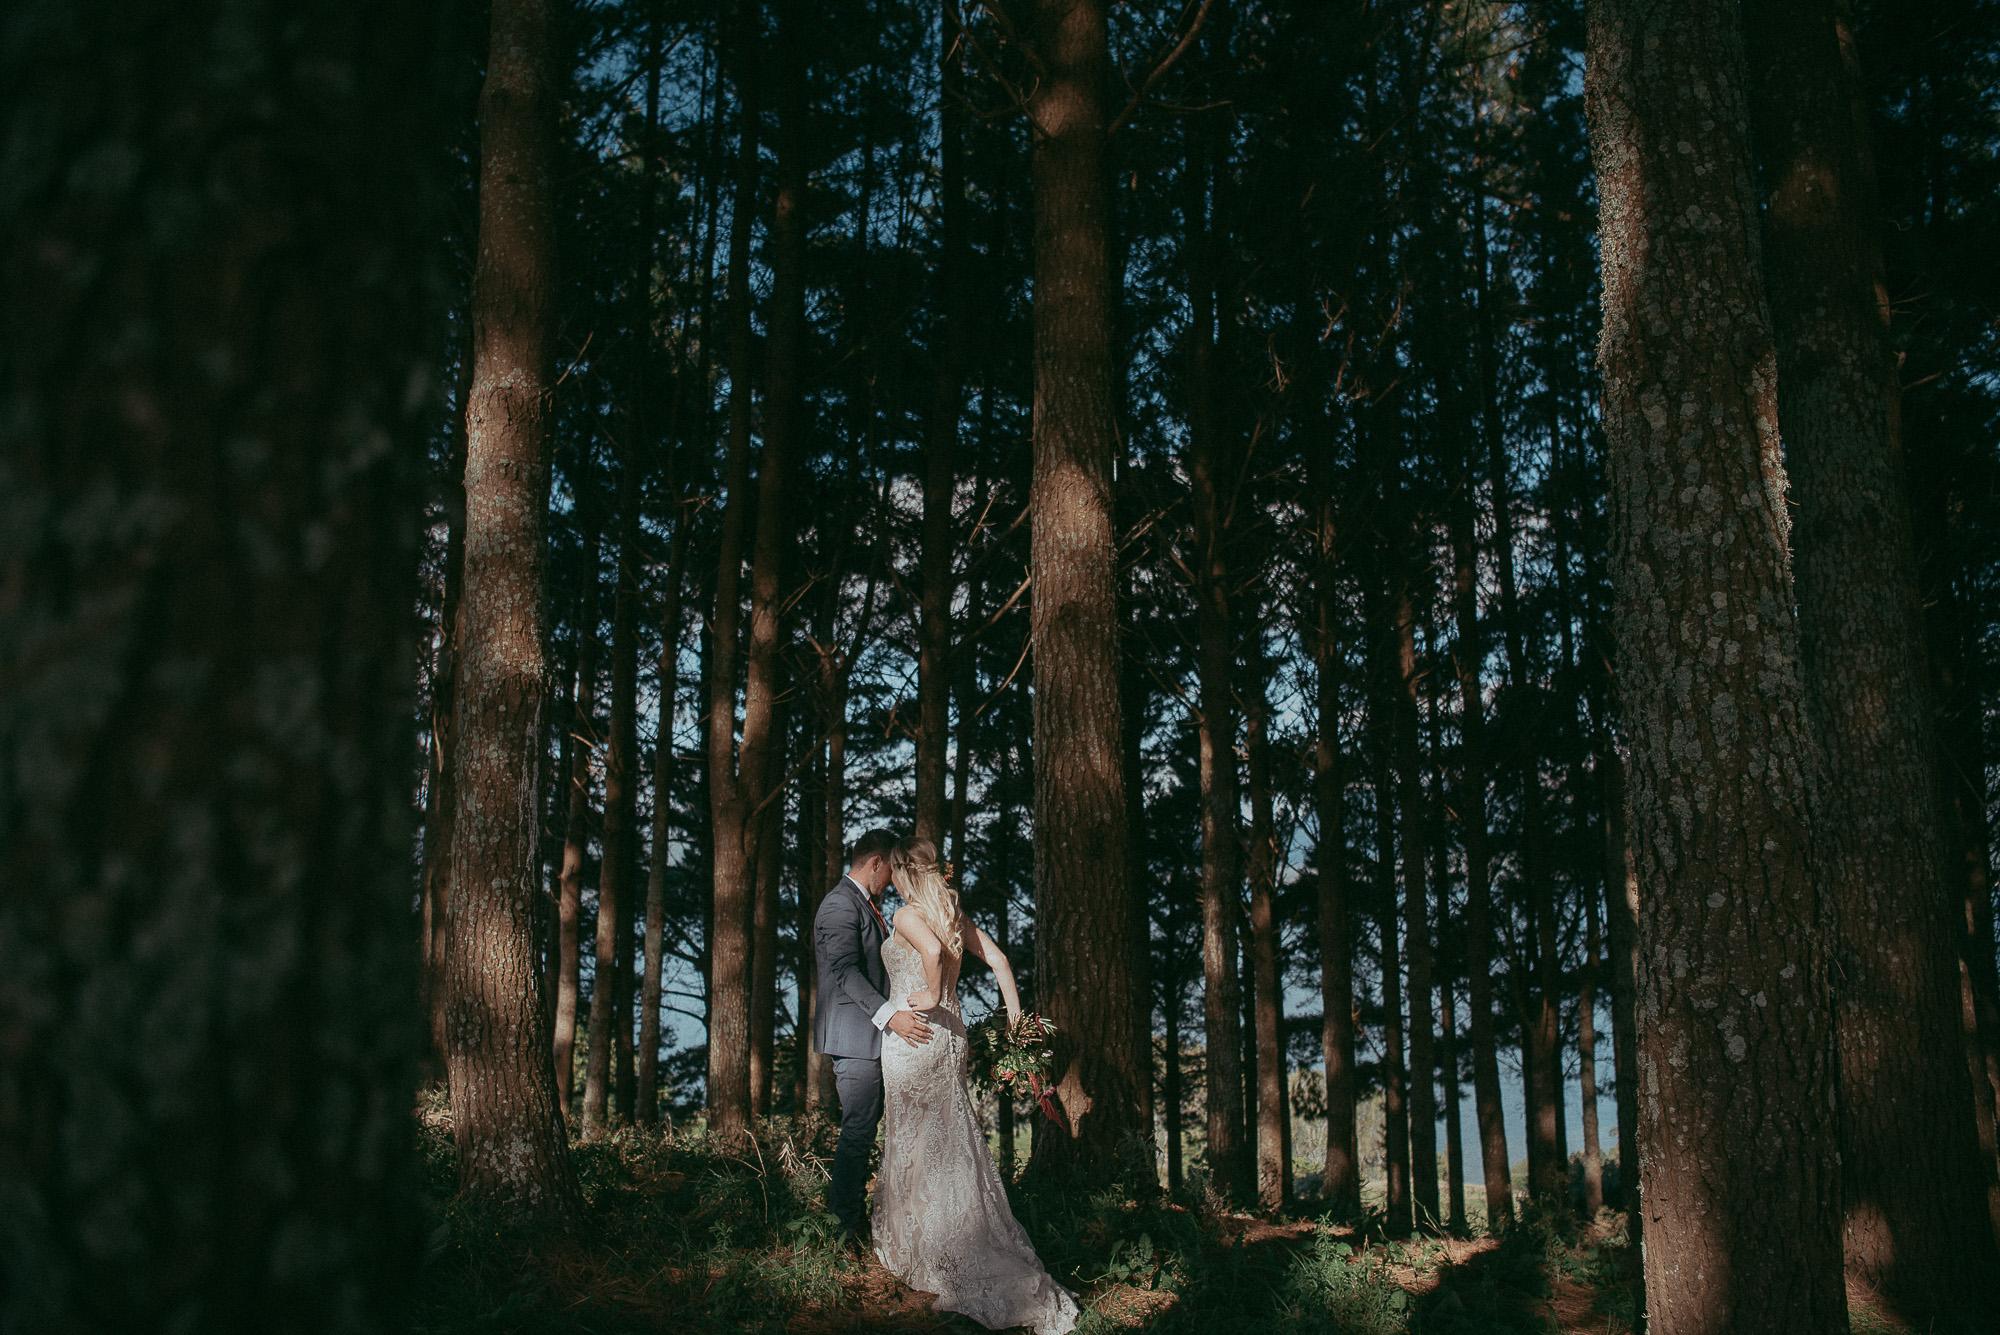 wedding-by-levien-567.JPG